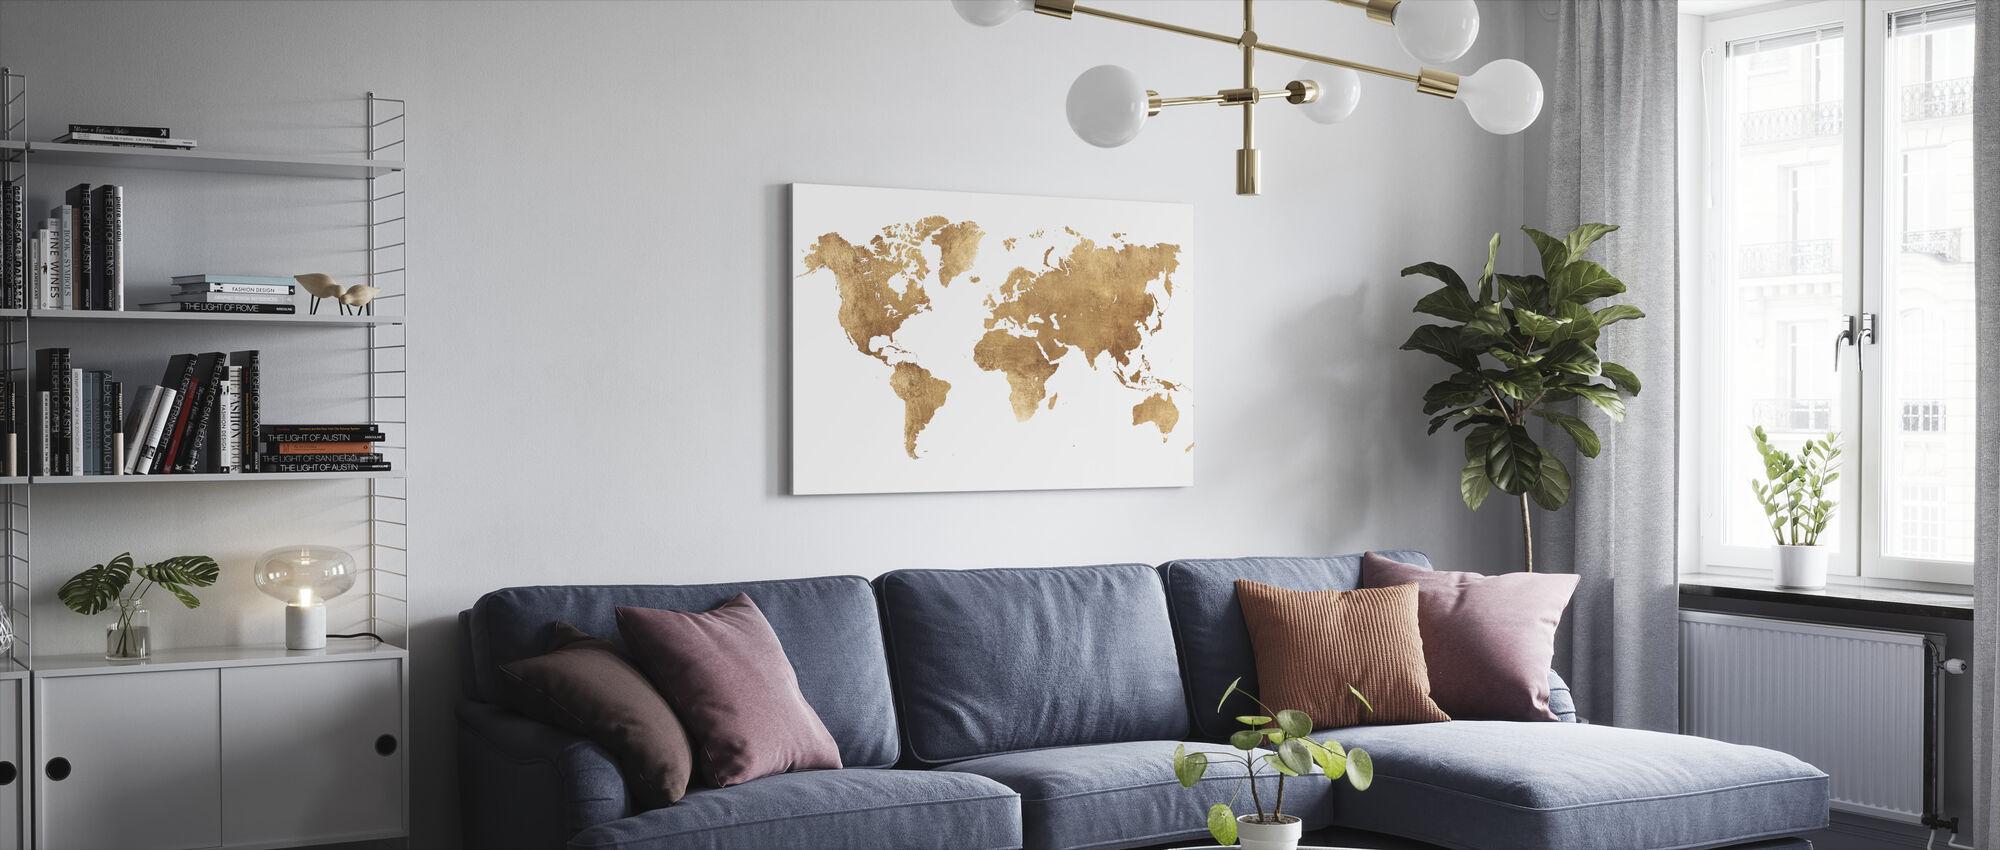 Världskarta borstad metall - Canvastavla - Vardagsrum